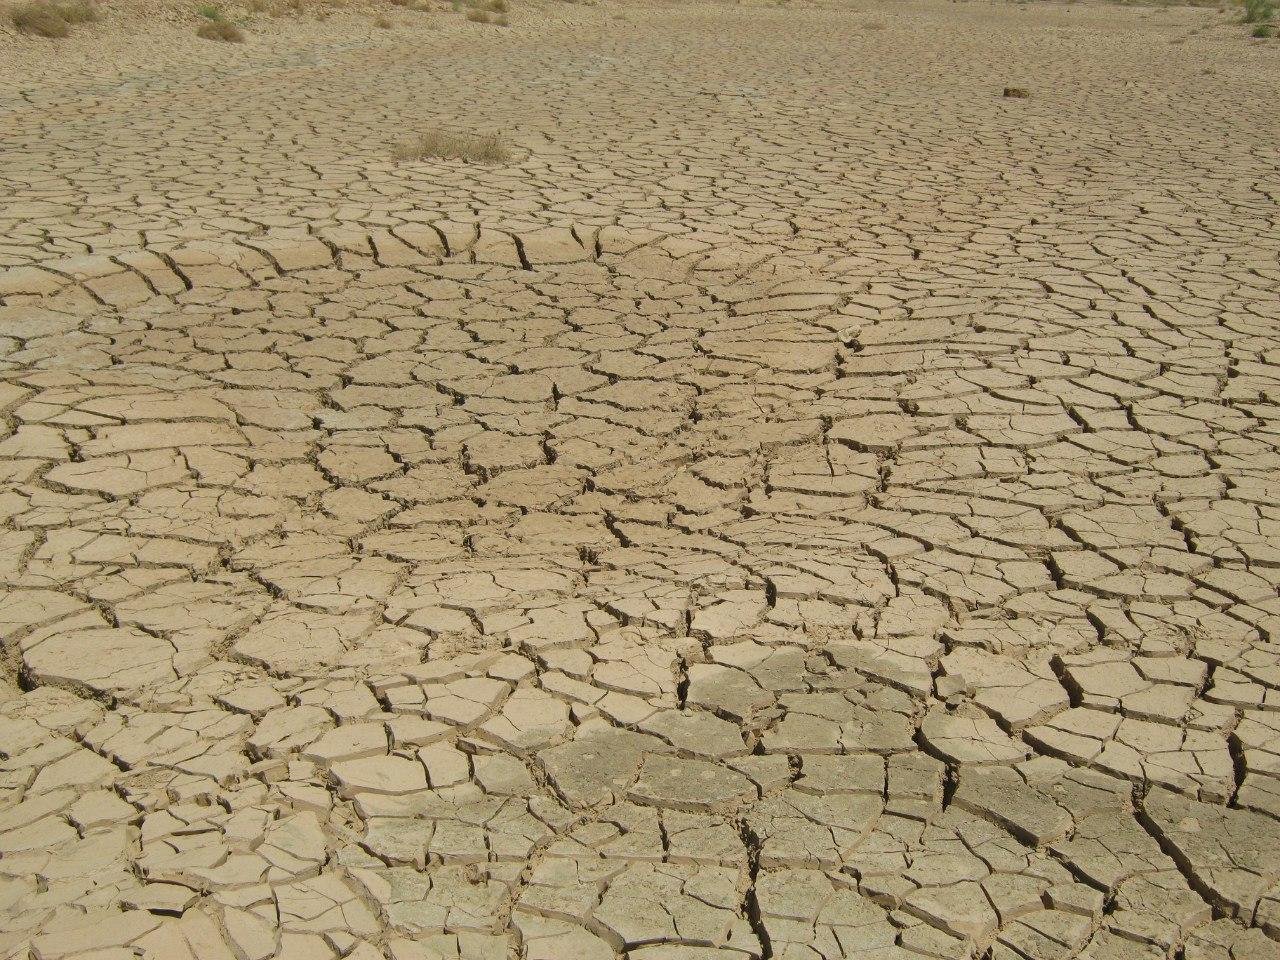 давно не было дождя арабских стран